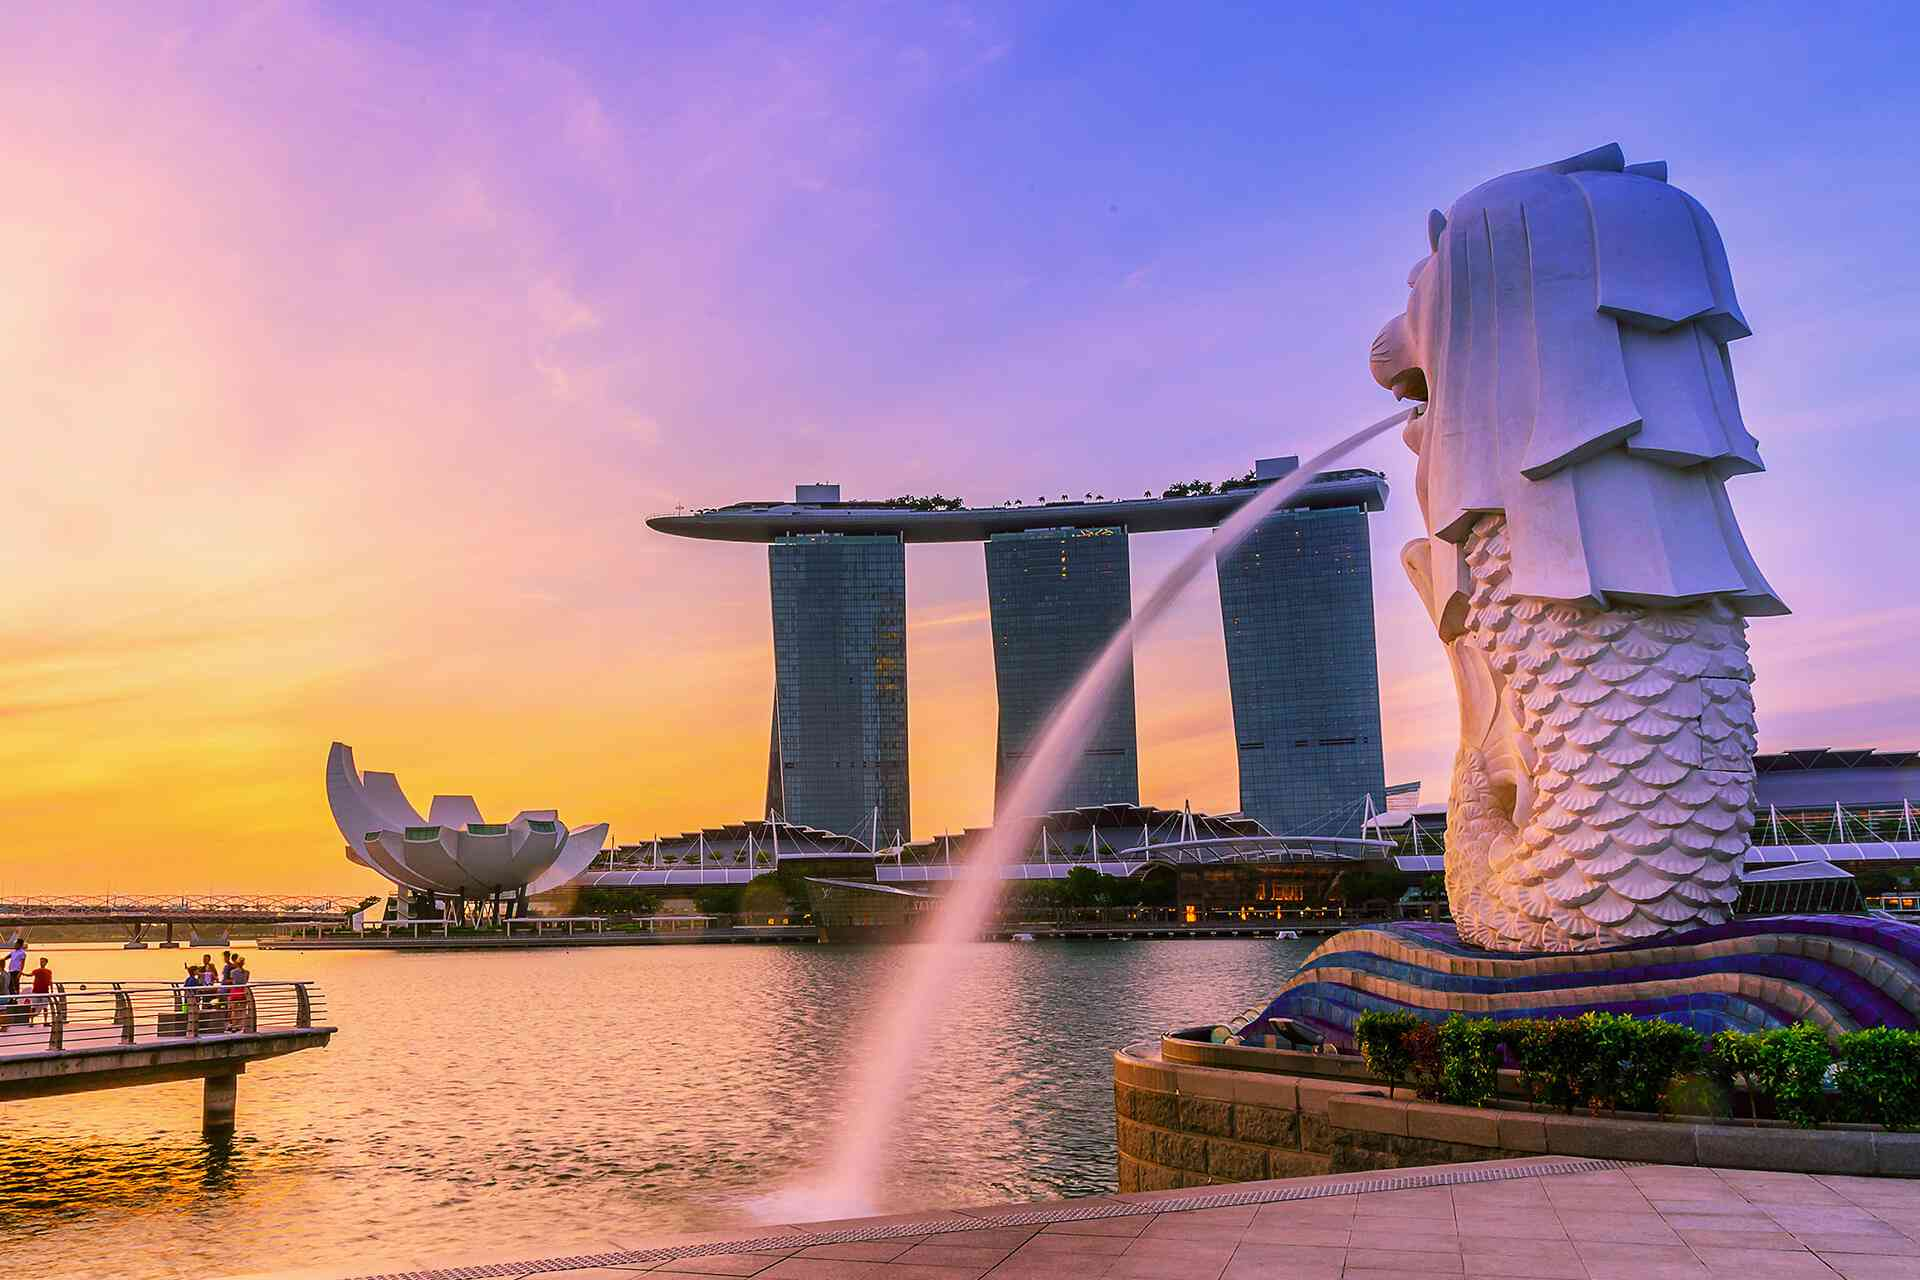 Singapore - Merlion Park